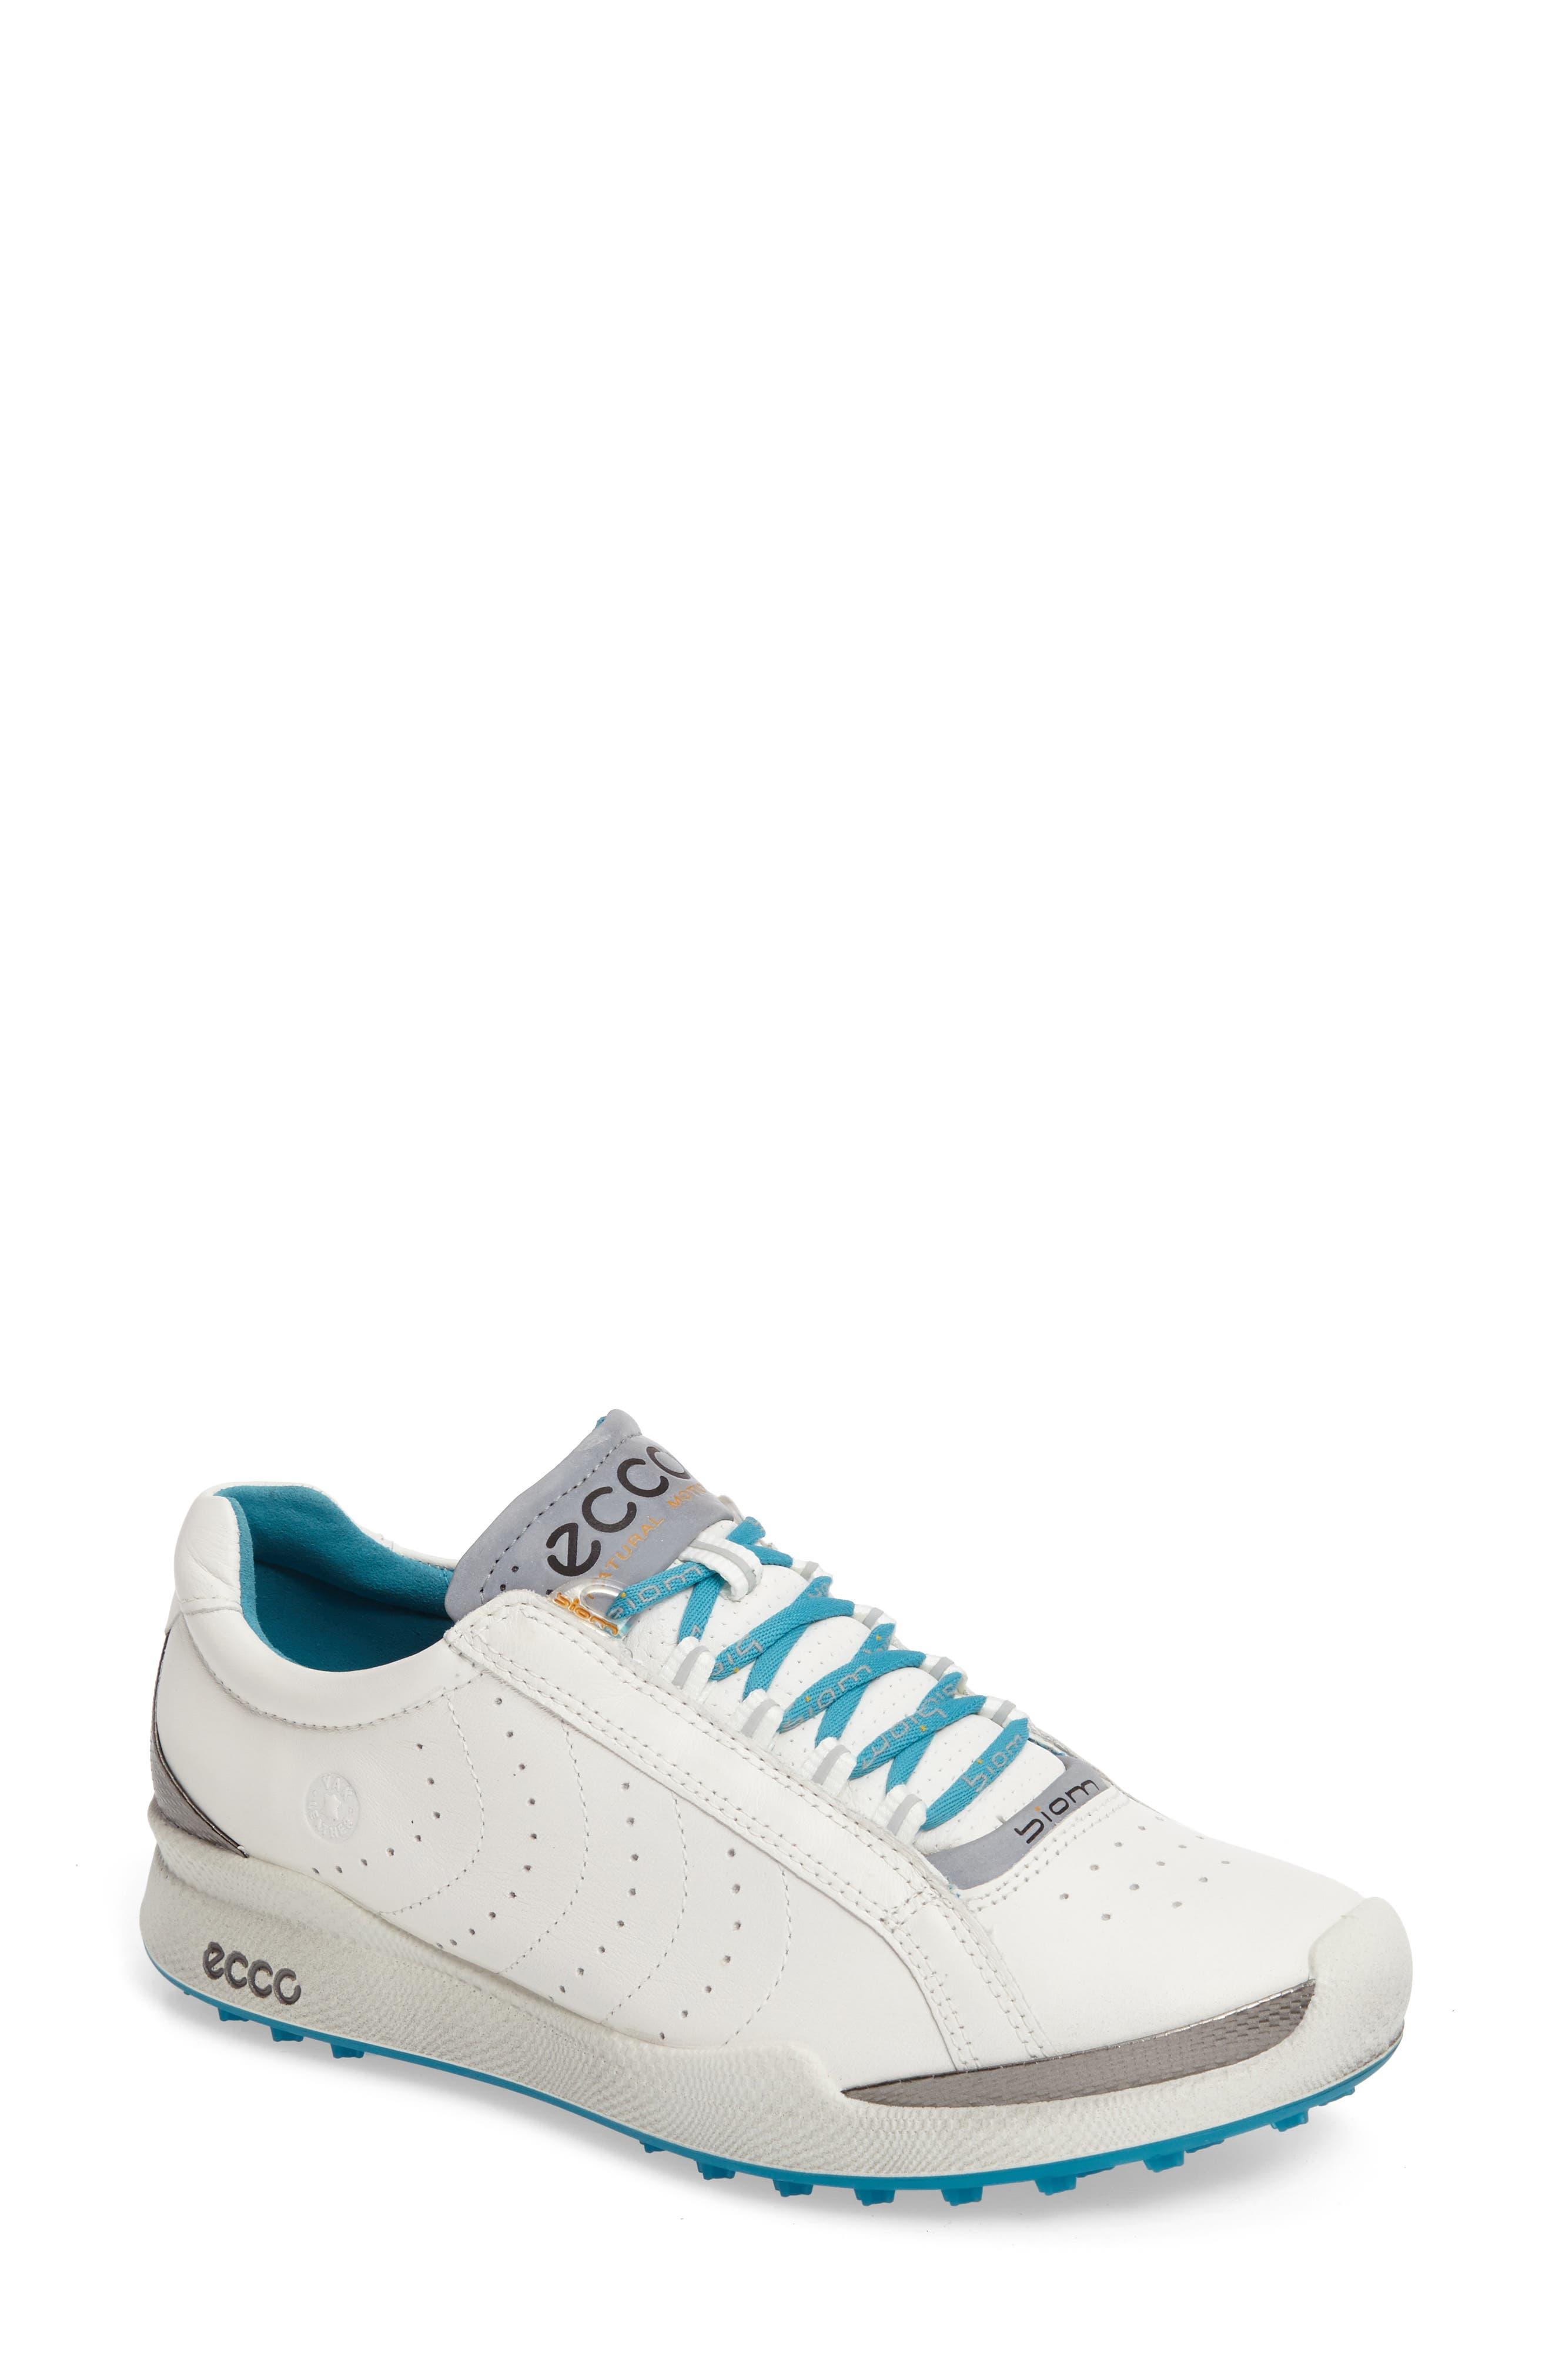 Biom 2 Waterproof Golf Shoe,                             Main thumbnail 1, color,                             White